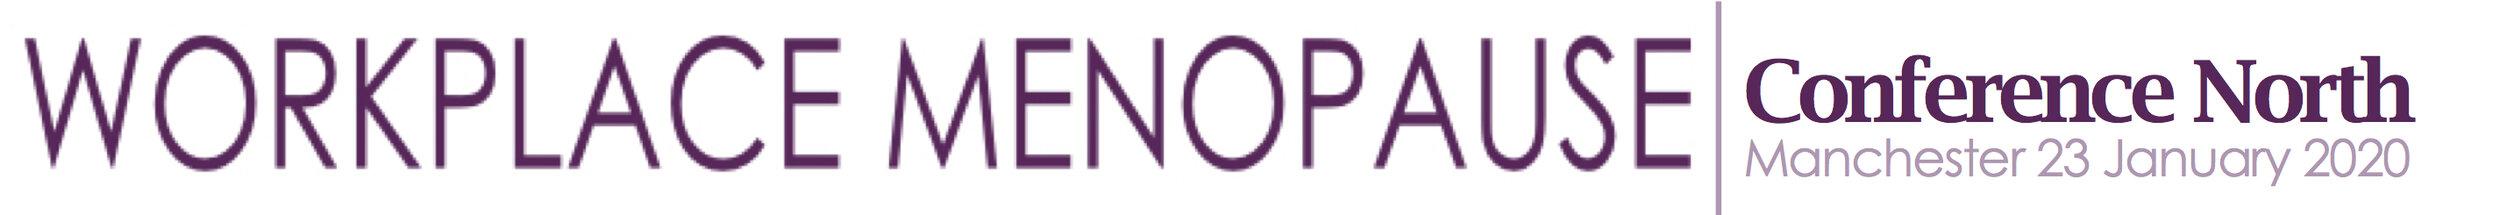 WP Menopause.key 08.04.44.jpg